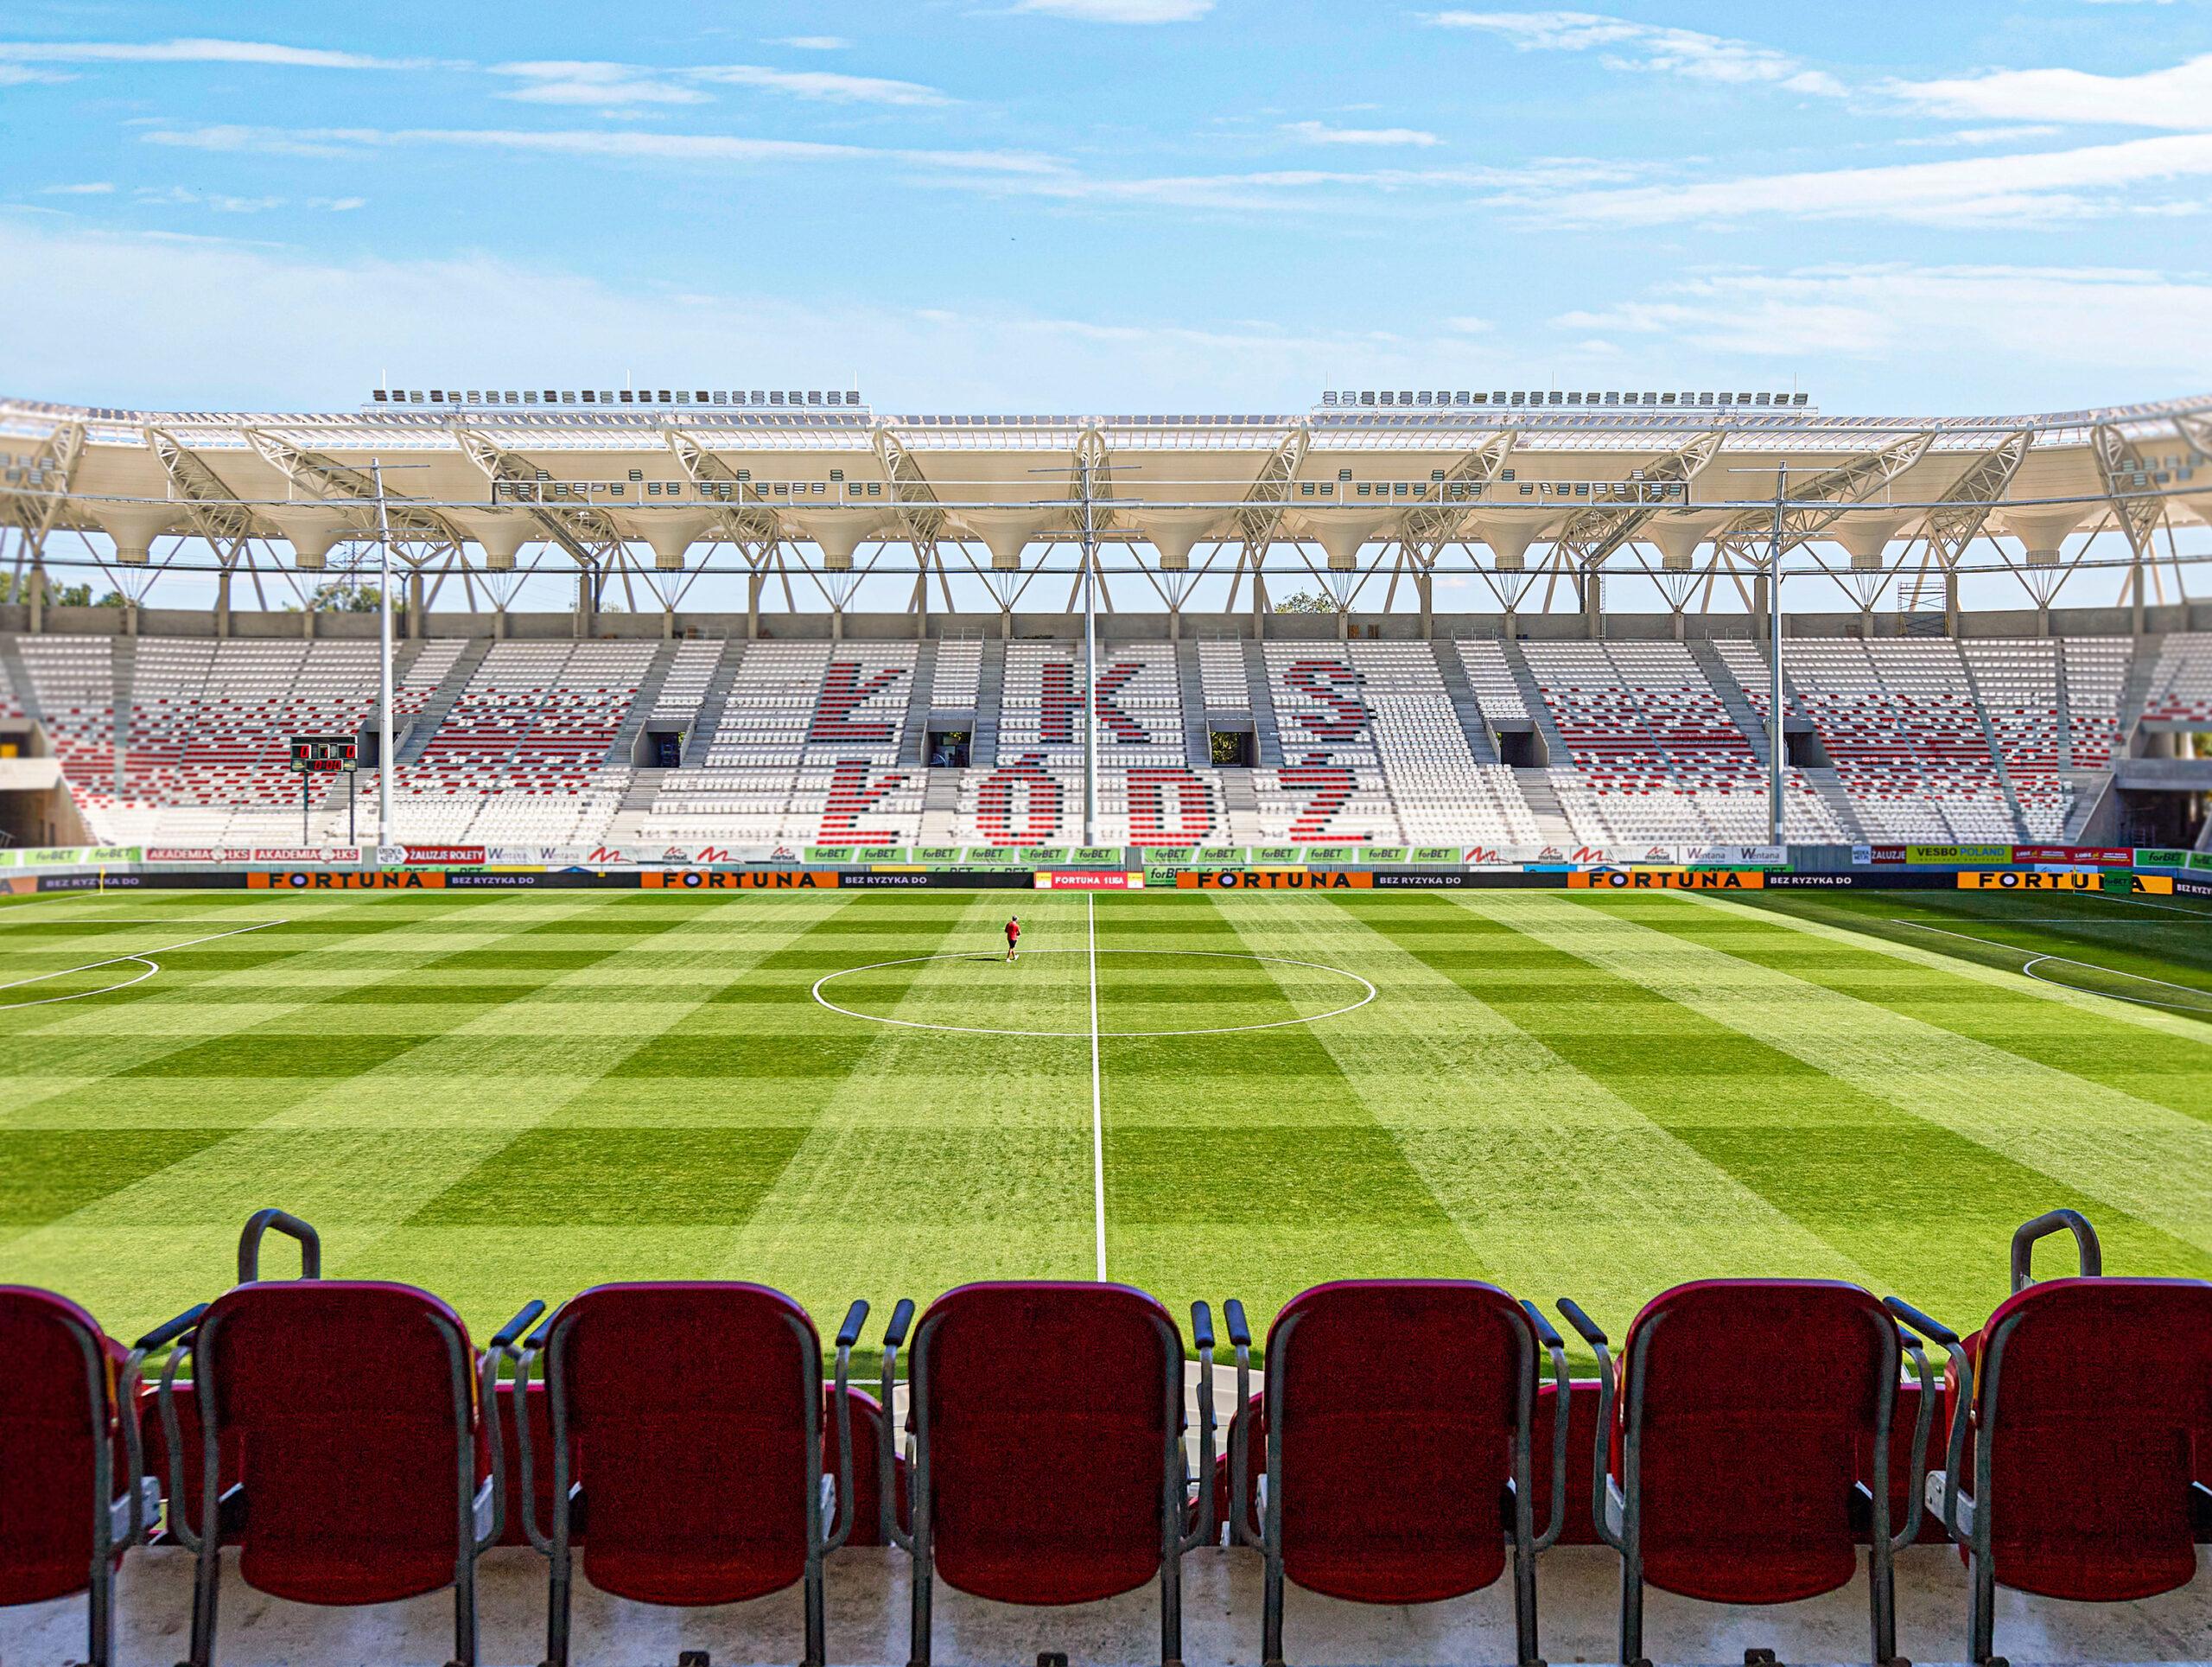 stadion lks lodz uklad krzeselek 2 scaled - stadion-lks-lodz-uklad-krzeselek-2